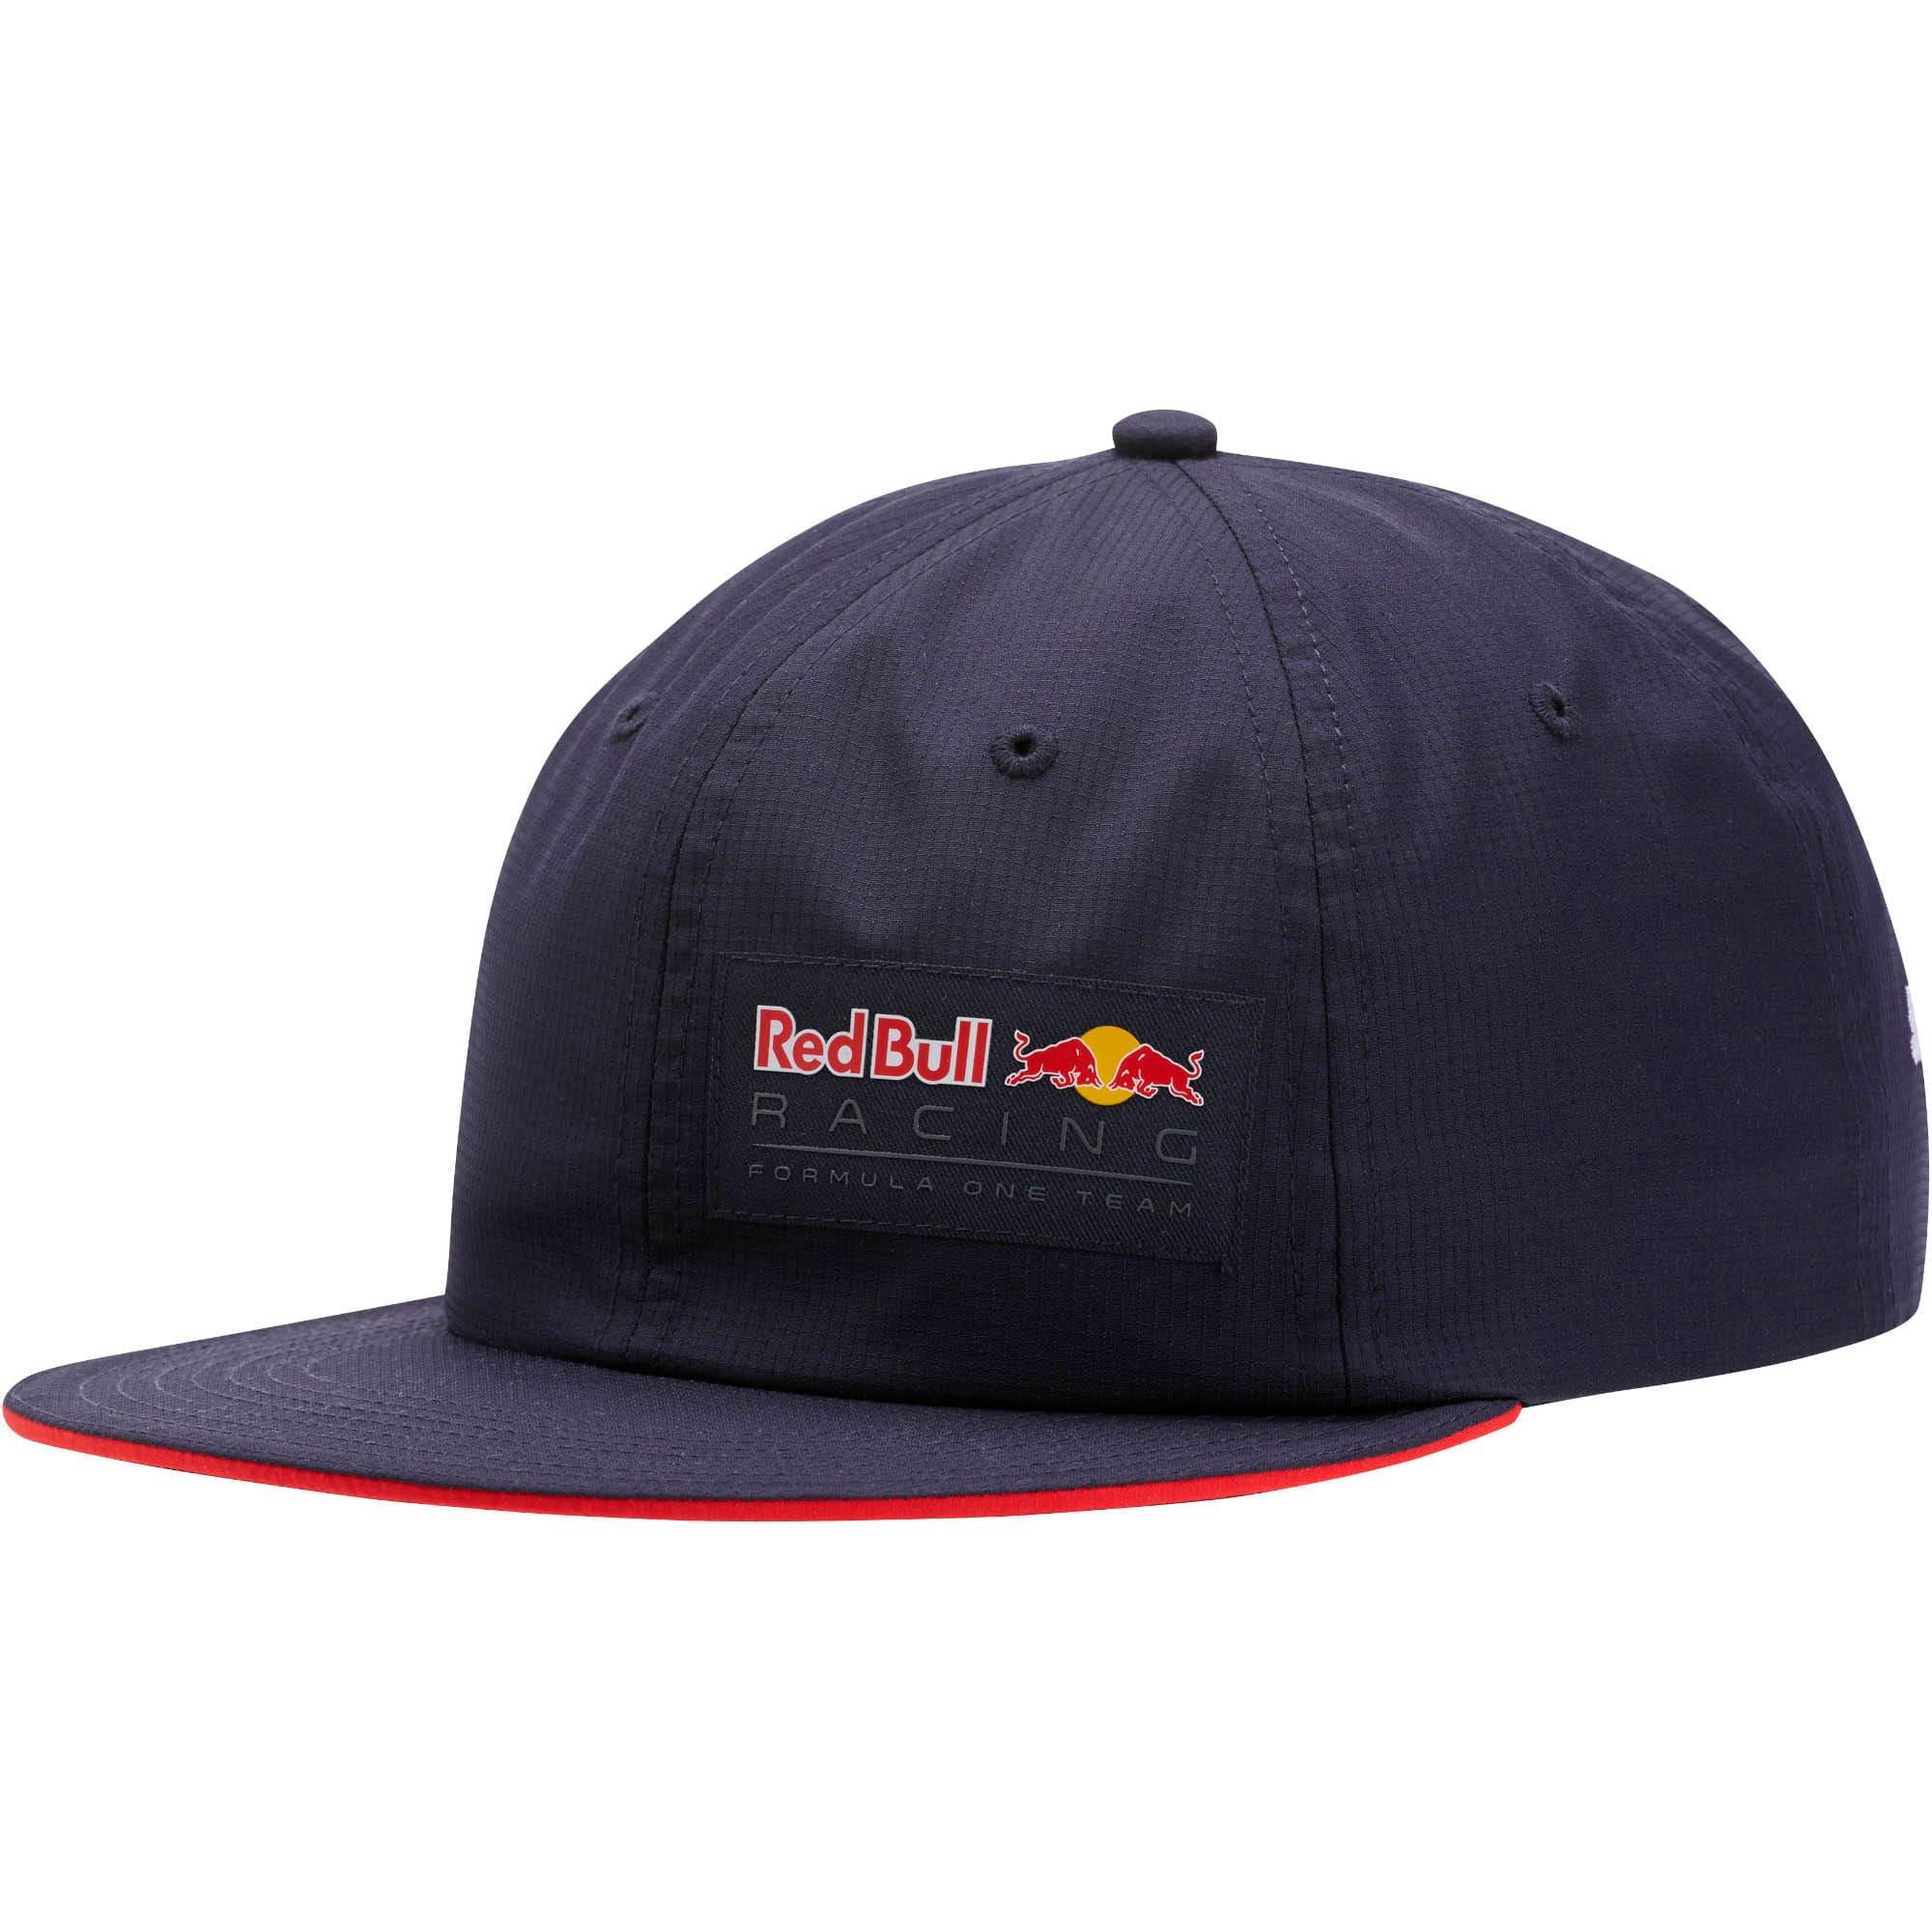 Thumbnail 1 of Red Bull Racing Lifestyle Flatbrim Cap, NIGHT SKY, medium